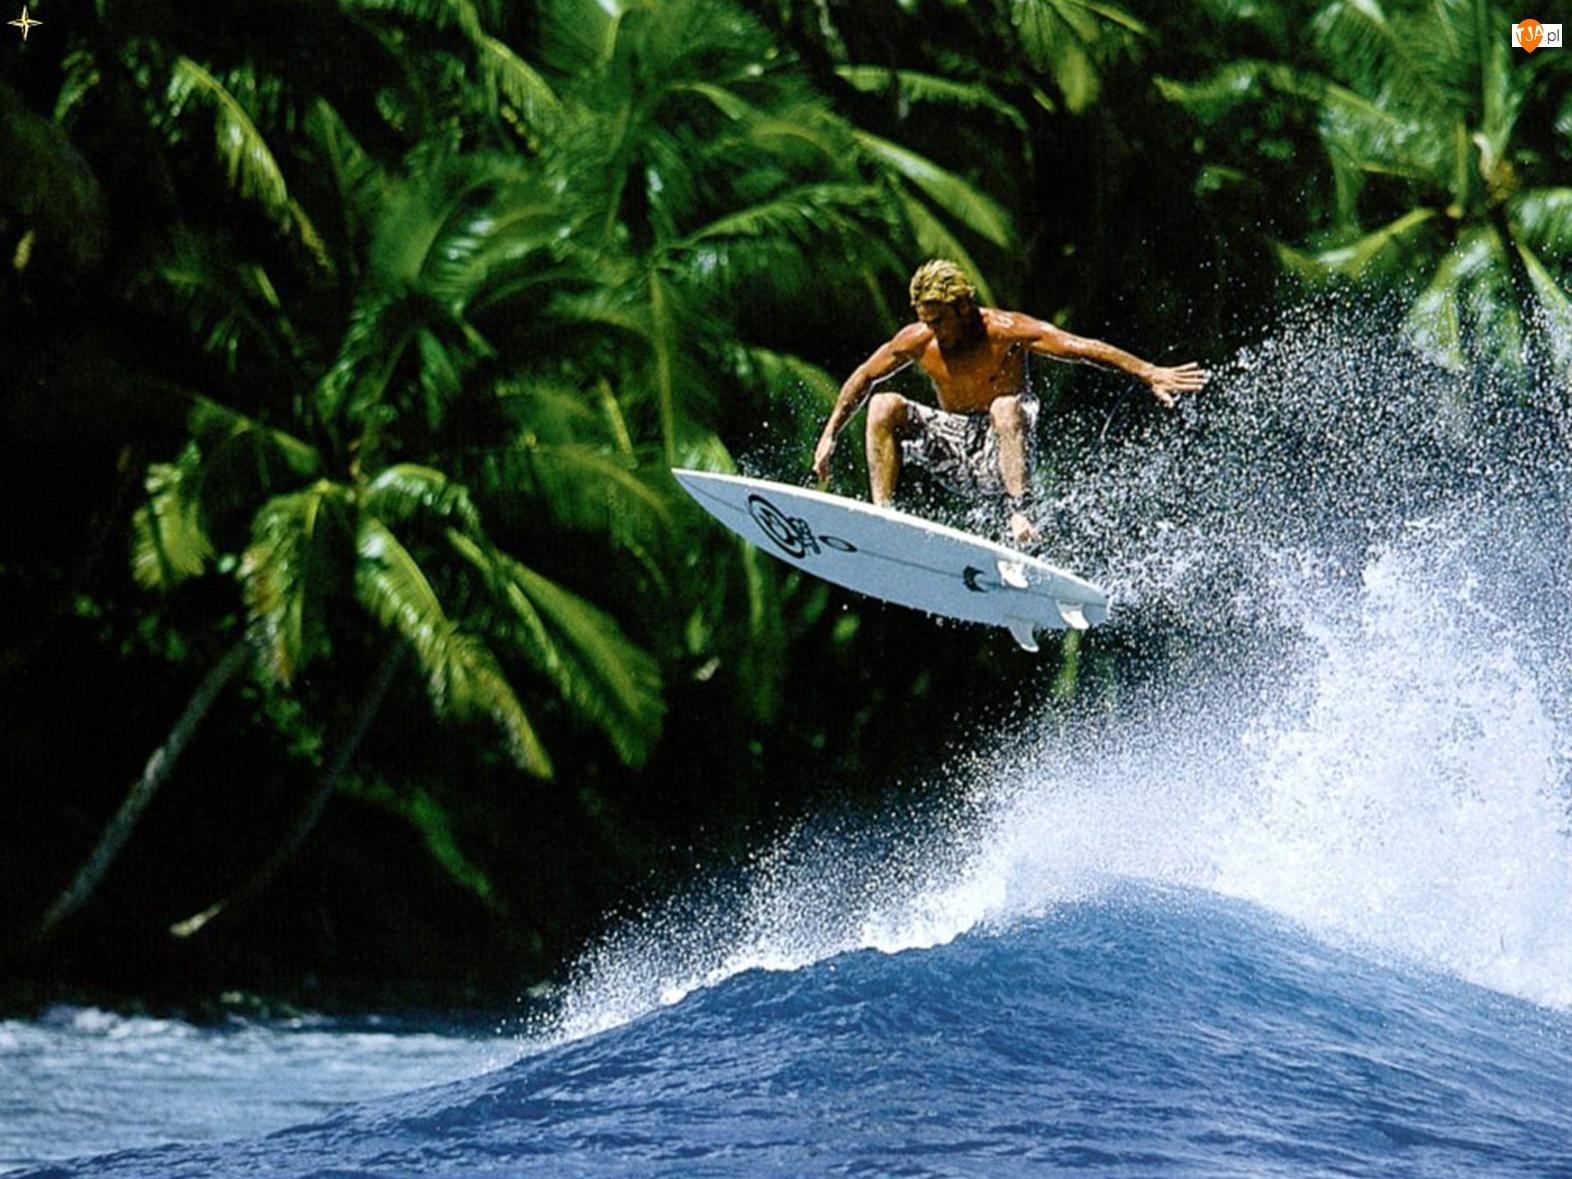 Palmy, Surfing, Fala